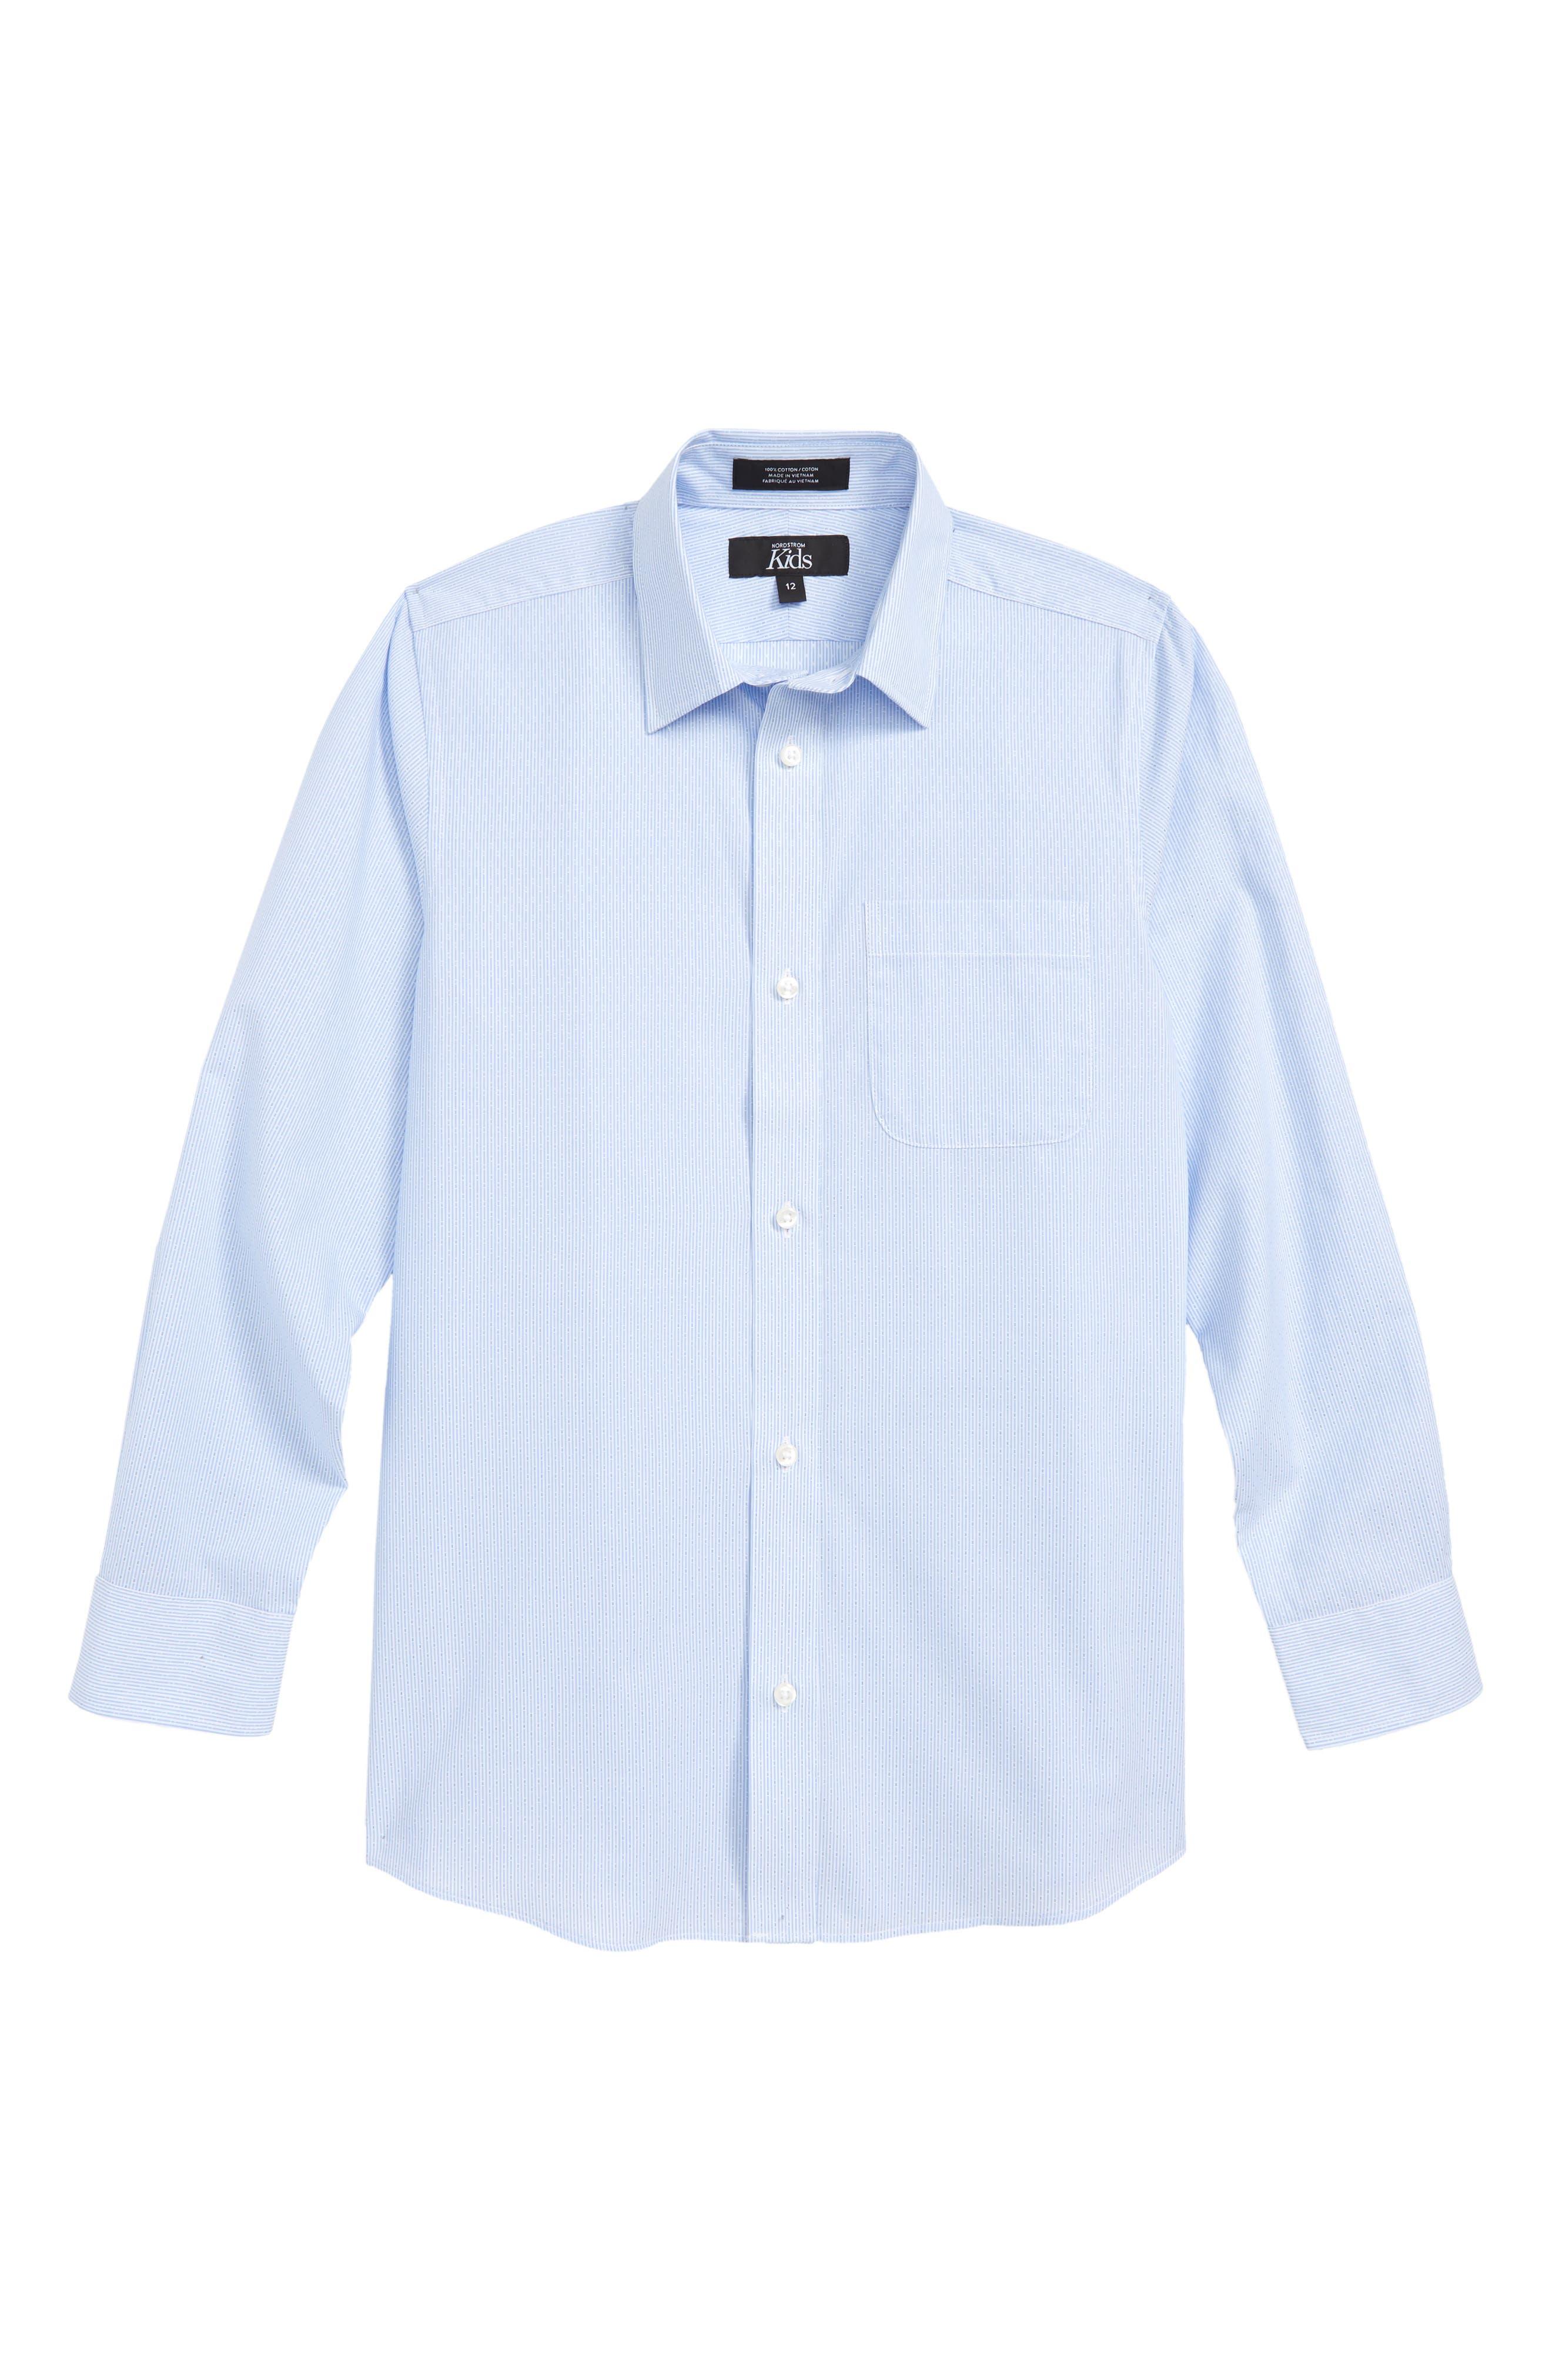 Robbia Dobby Dress Shirt,                         Main,                         color, Blue Robbia- White Dobby